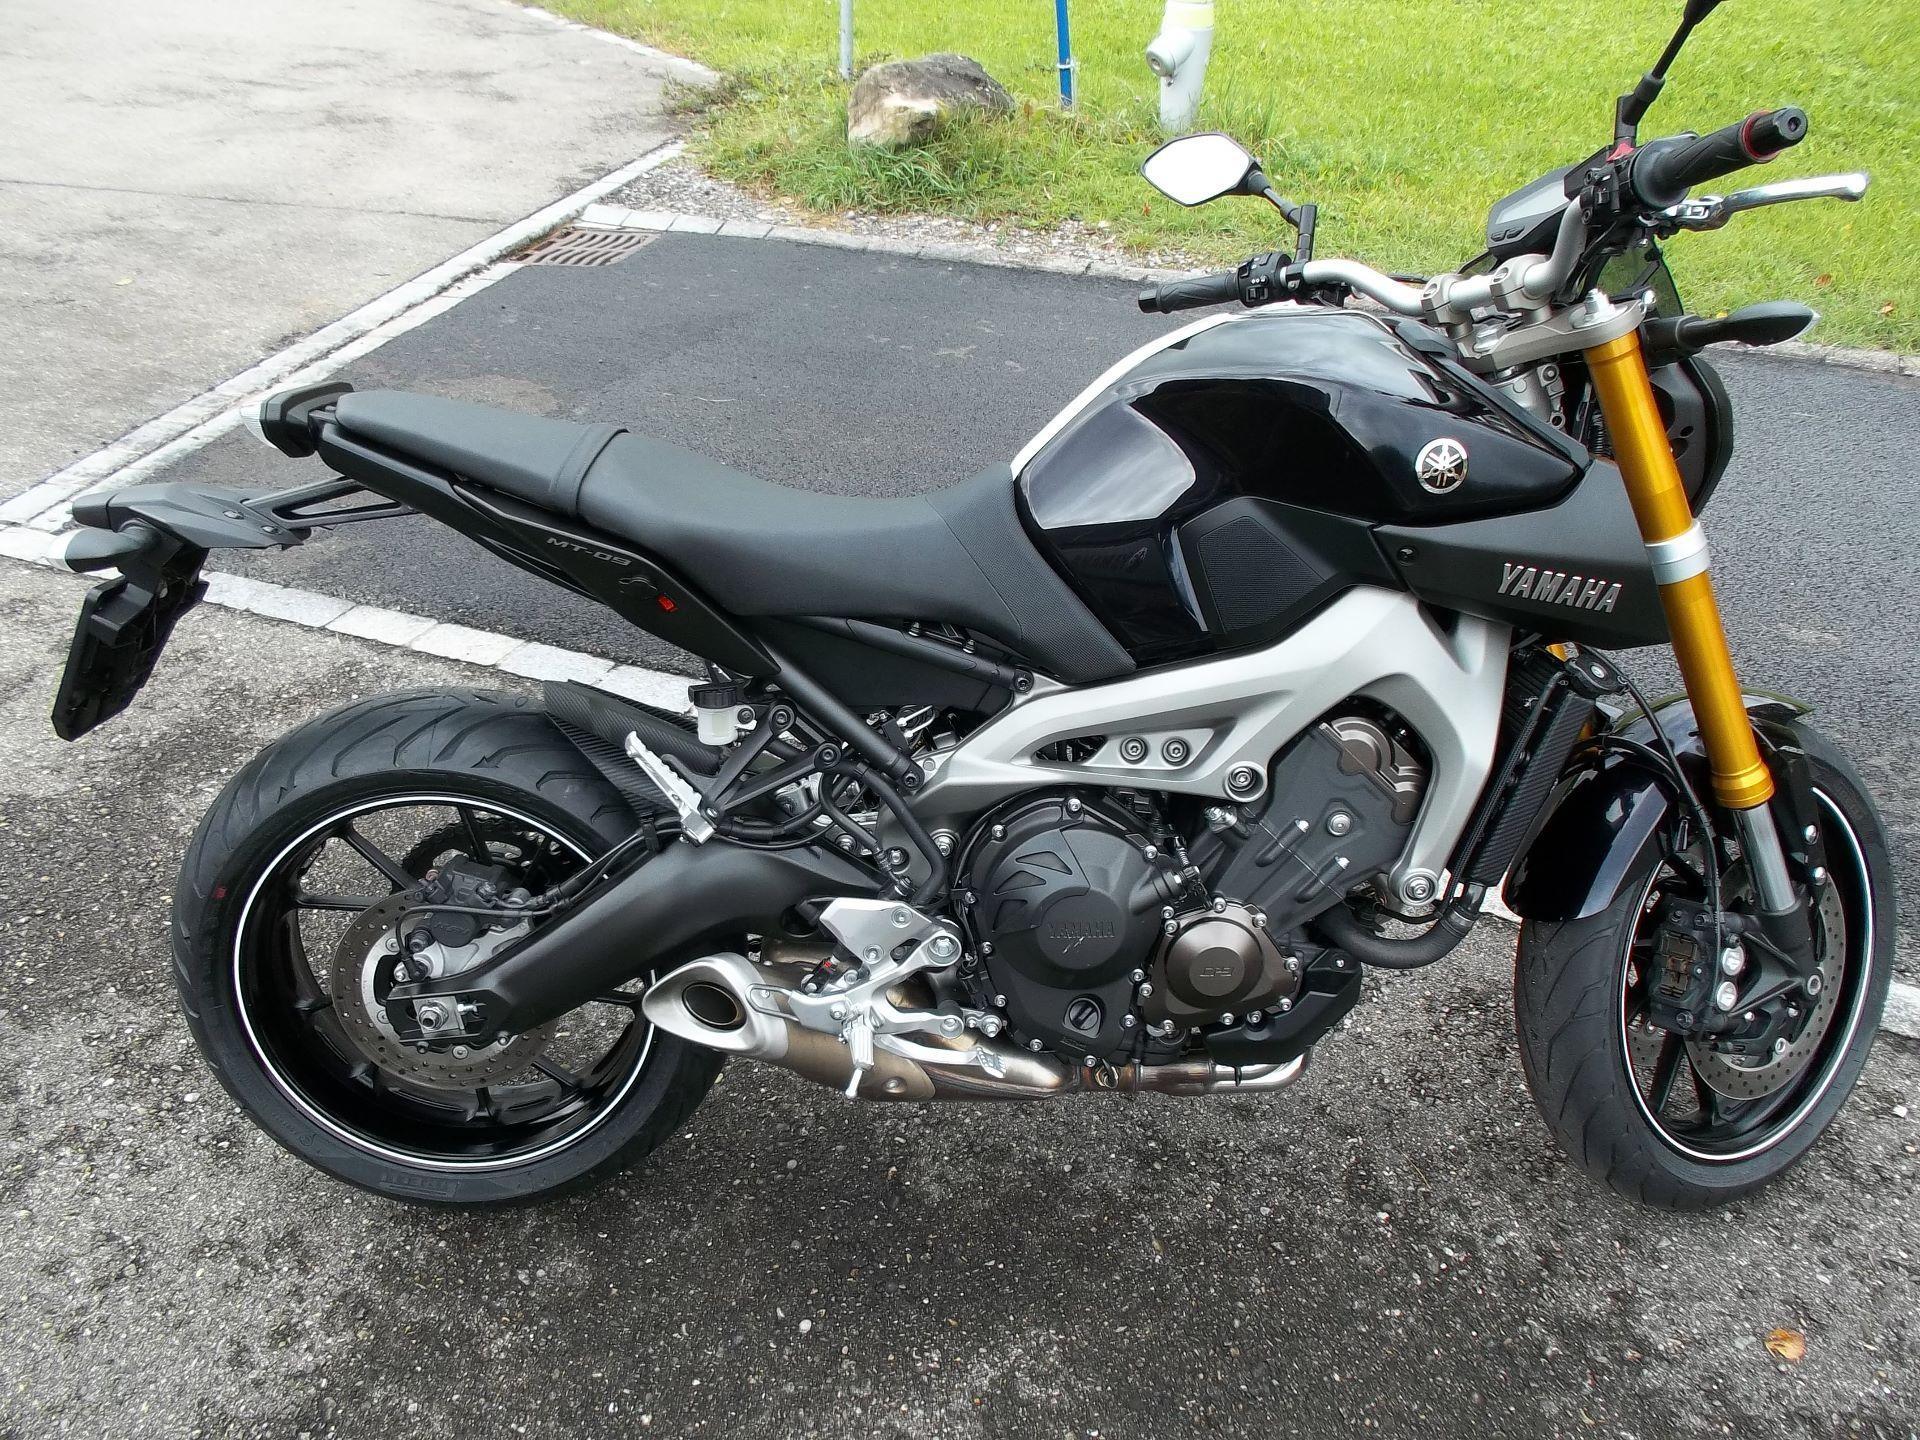 moto occasions acheter yamaha mt 09 abs stieger motos kollbrunn. Black Bedroom Furniture Sets. Home Design Ideas